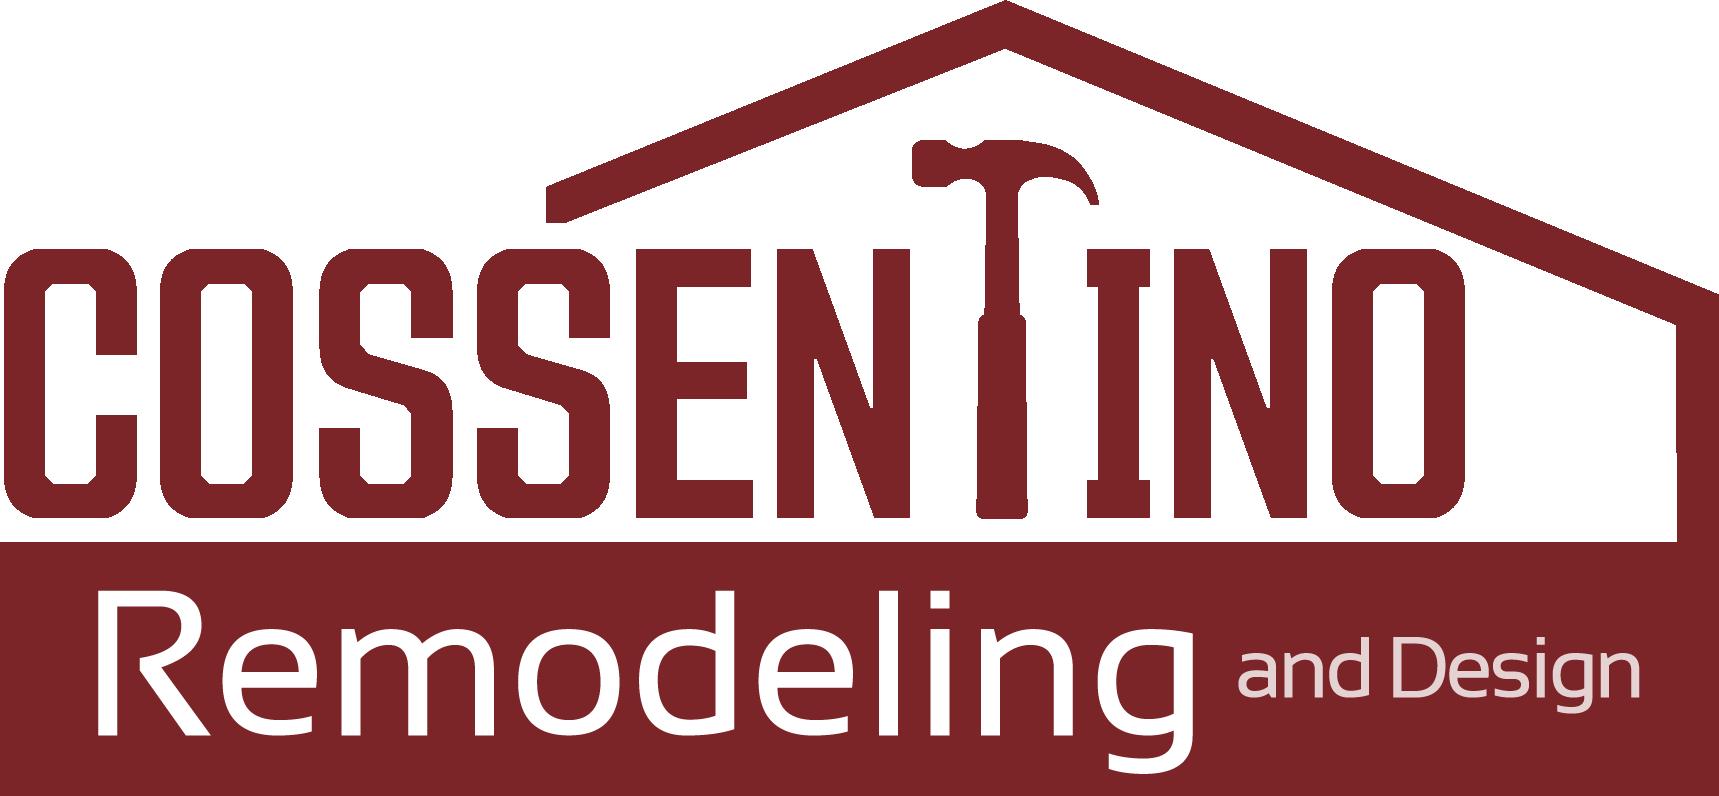 Cossentino & Sons